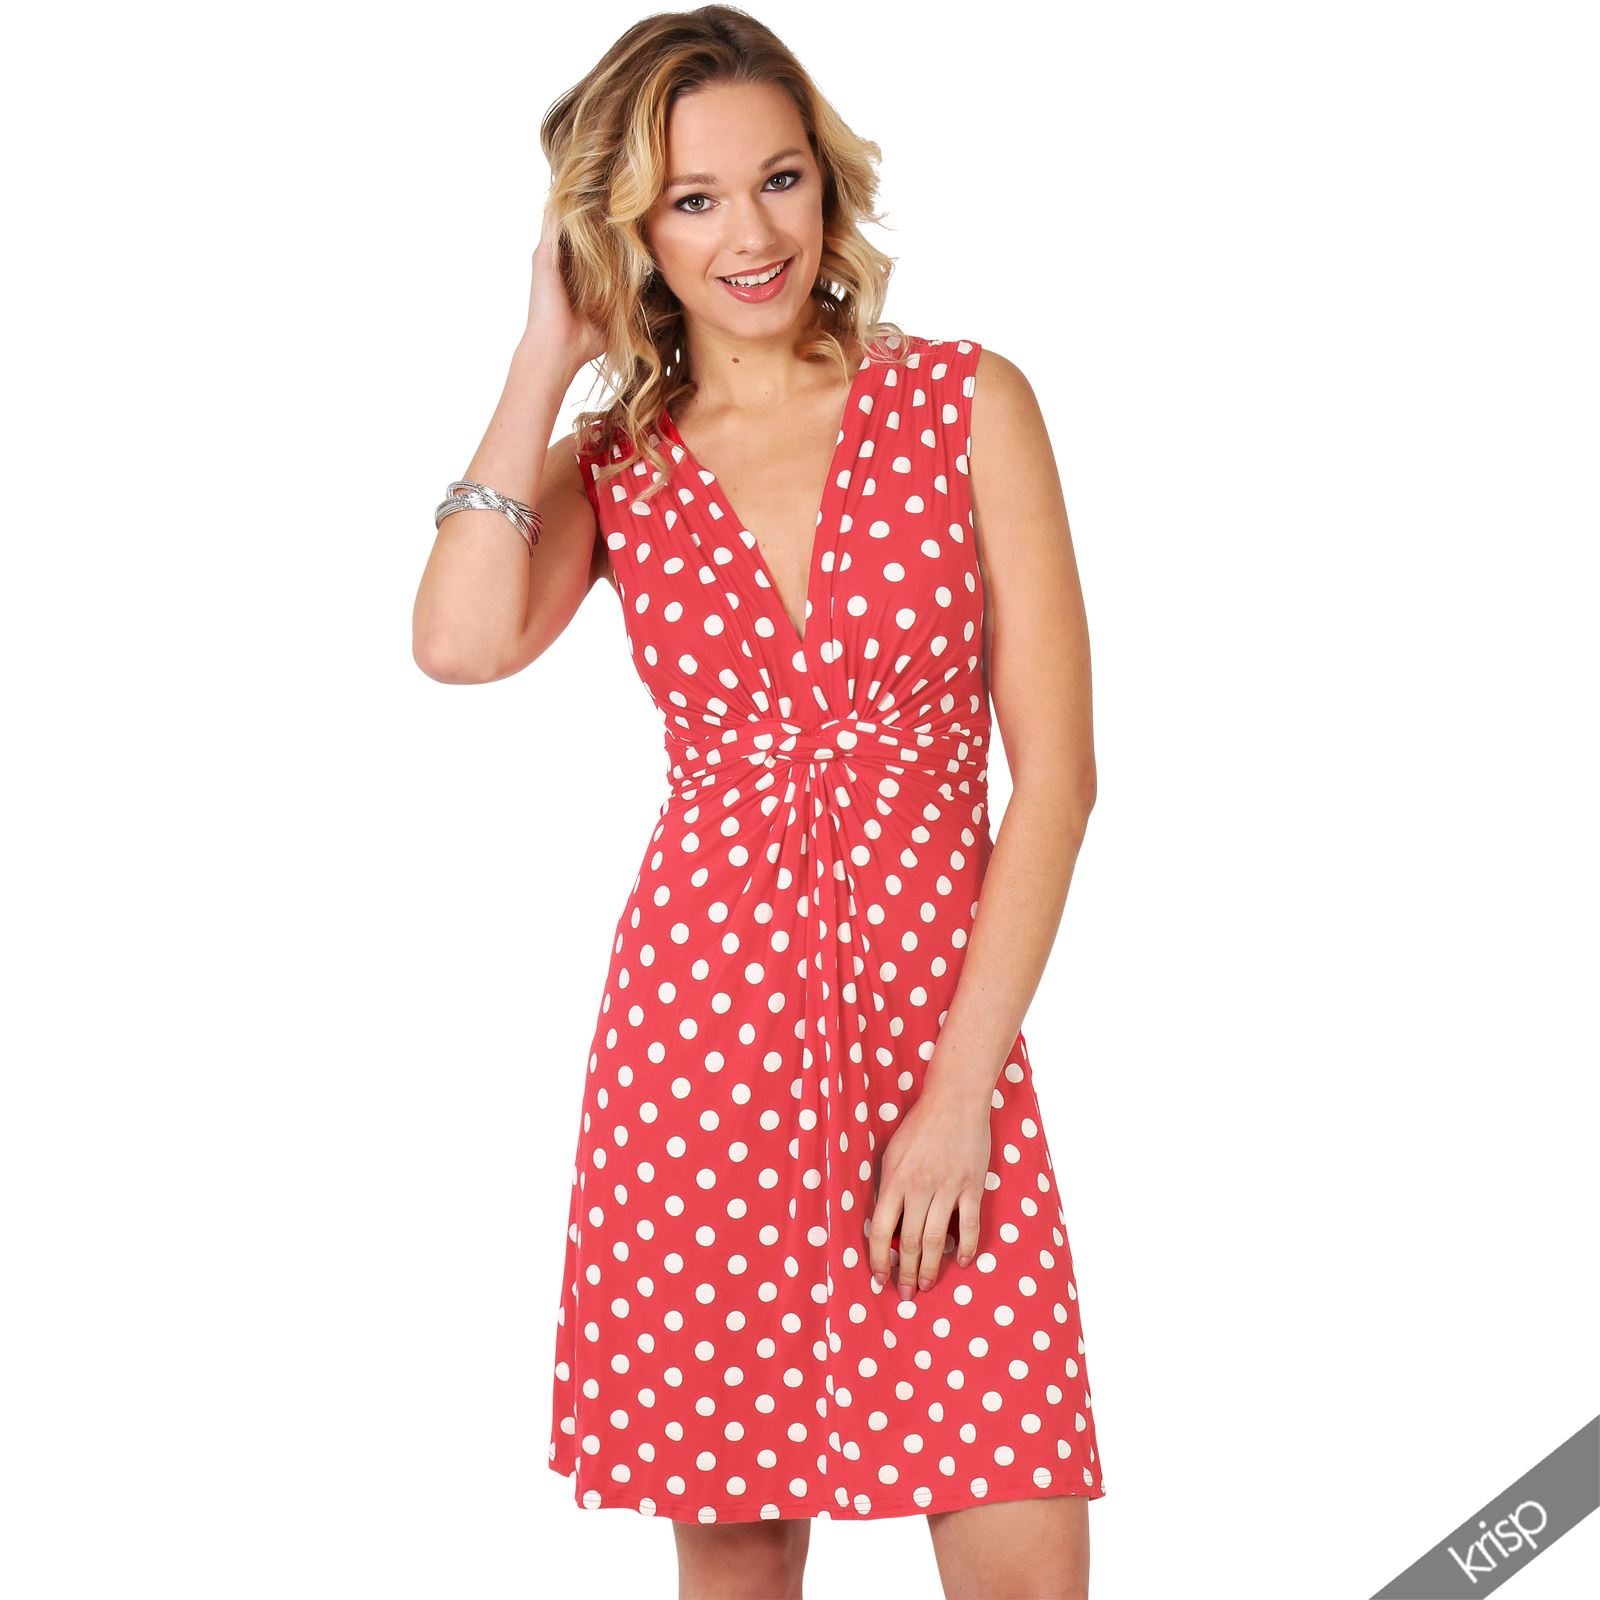 Womens-Polka-Dot-Retro-Dress-Pleated-Skirt-Wrap-Mini-V-Neck-Top-Swing-Party thumbnail 10